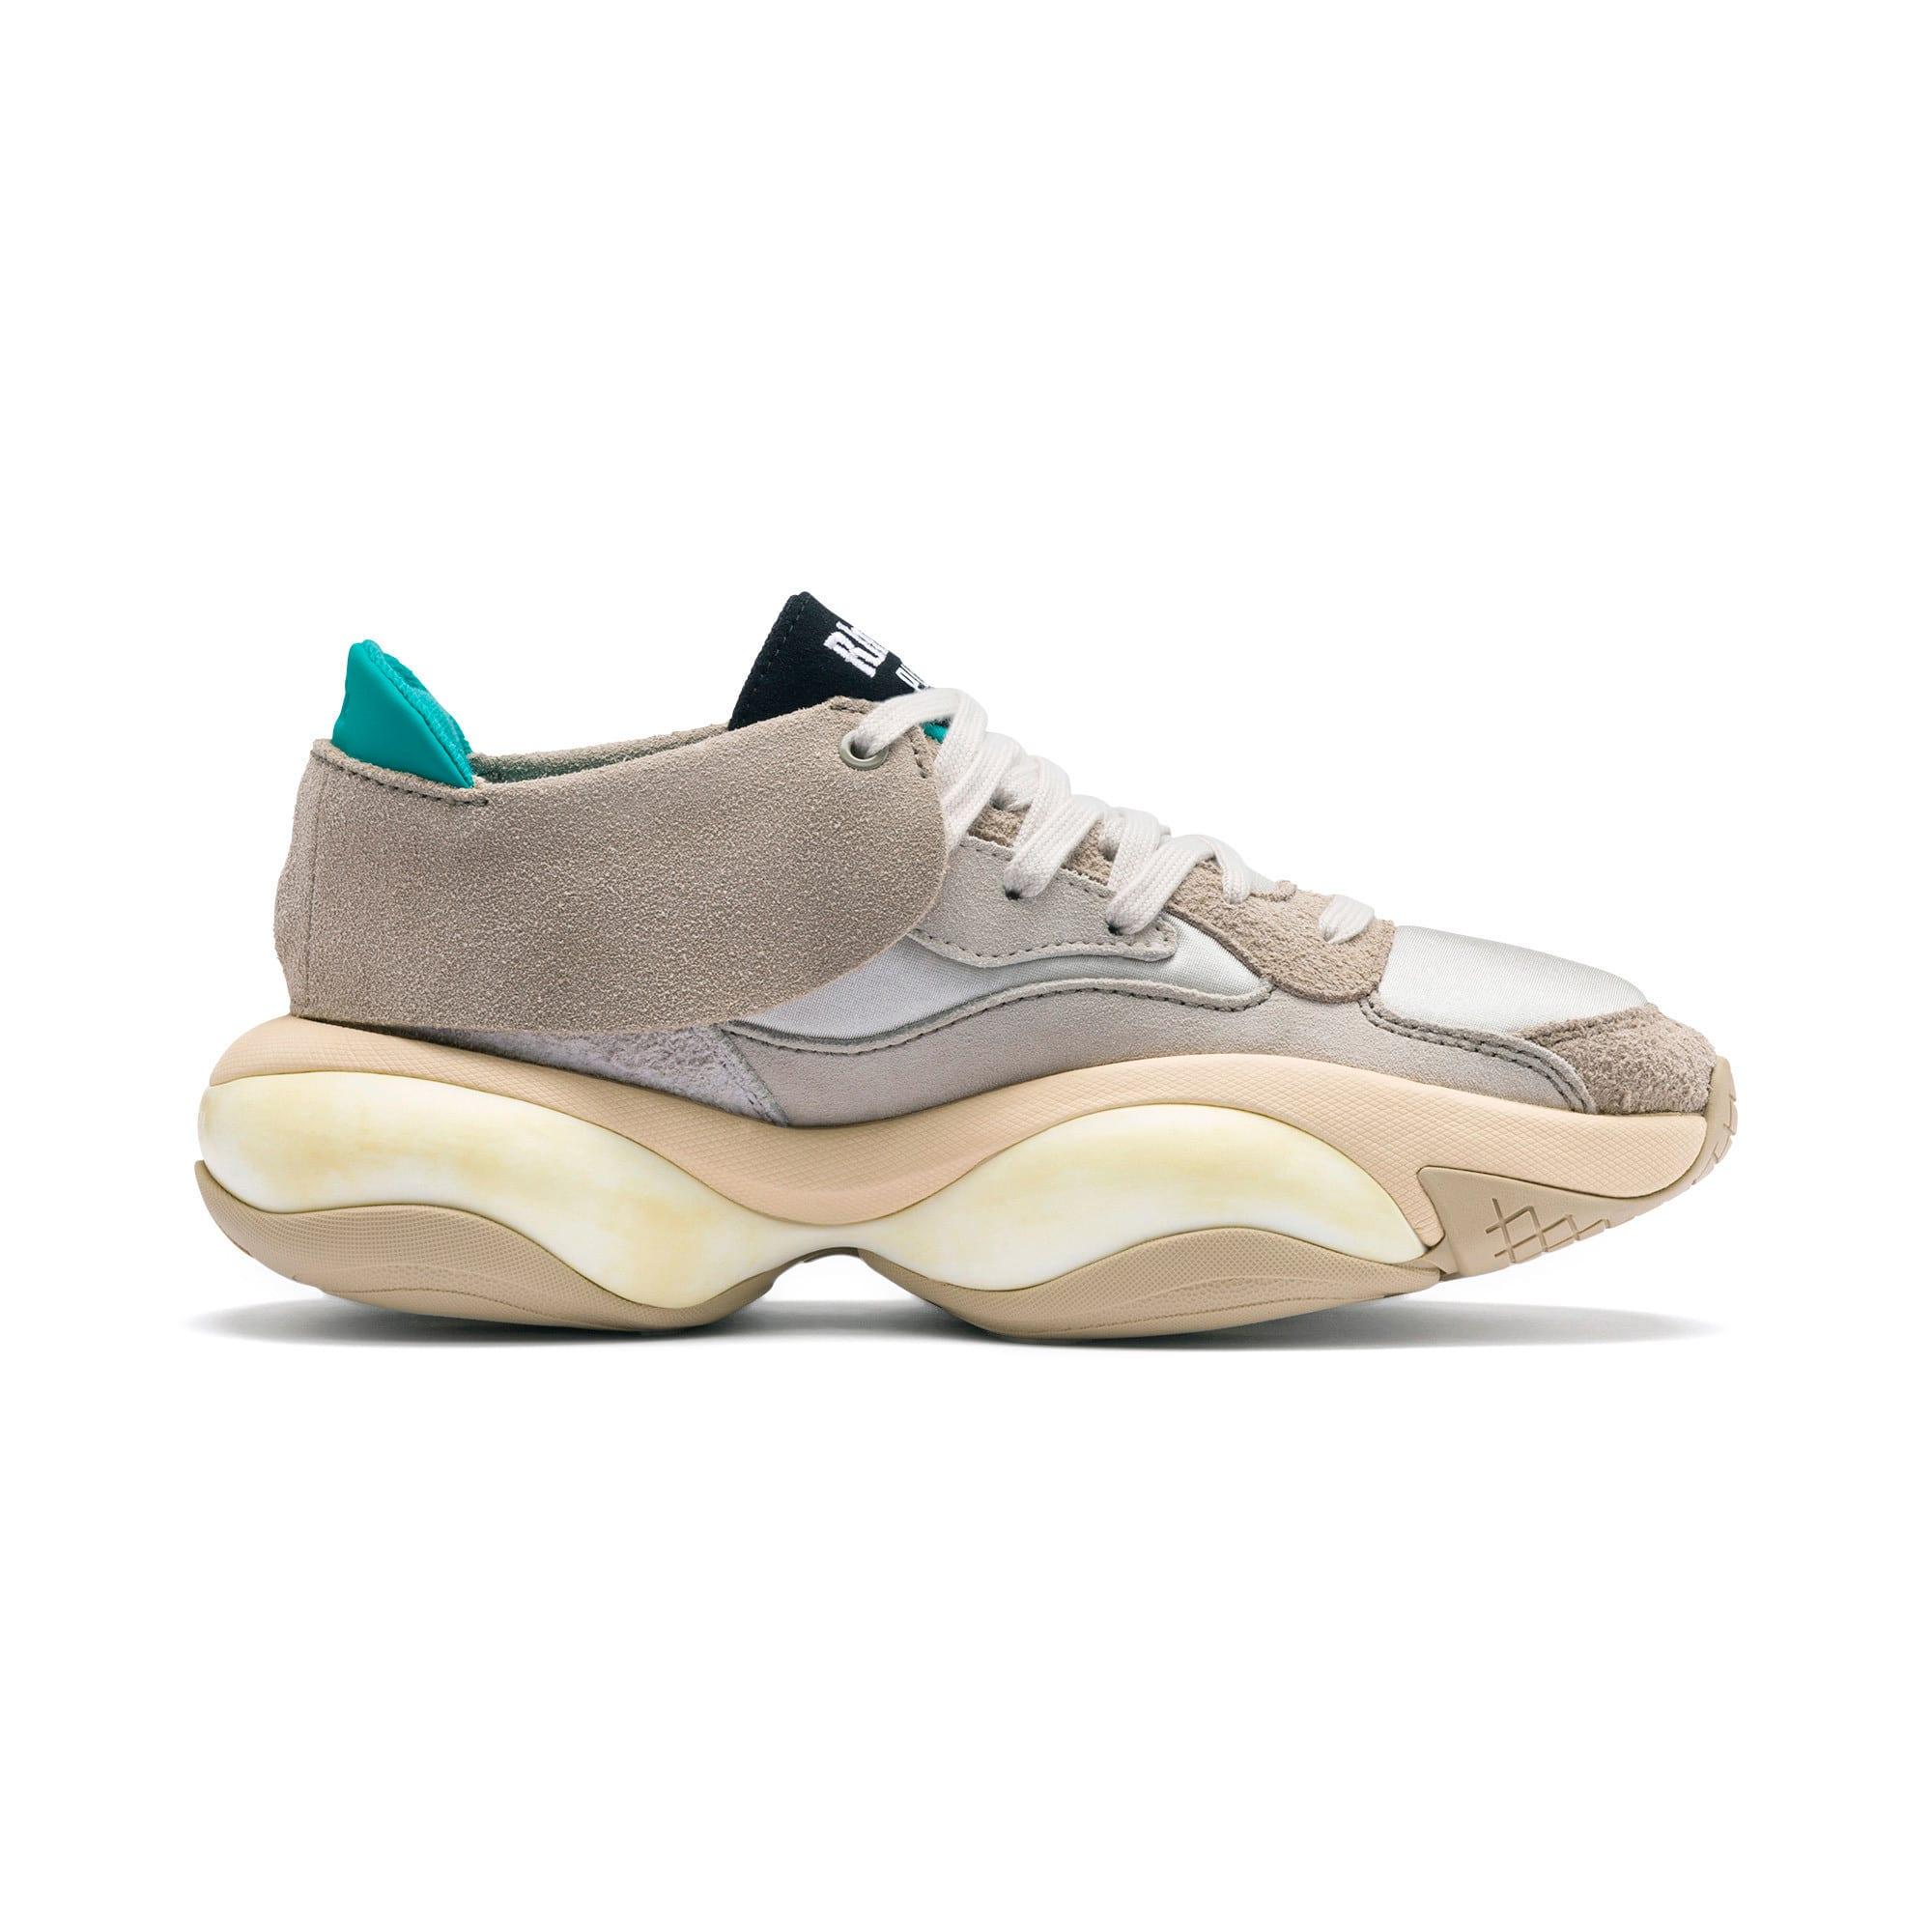 Thumbnail 5 of PUMA x RHUDE Alteration Sneakers, Chinchilla-Whisper White, medium